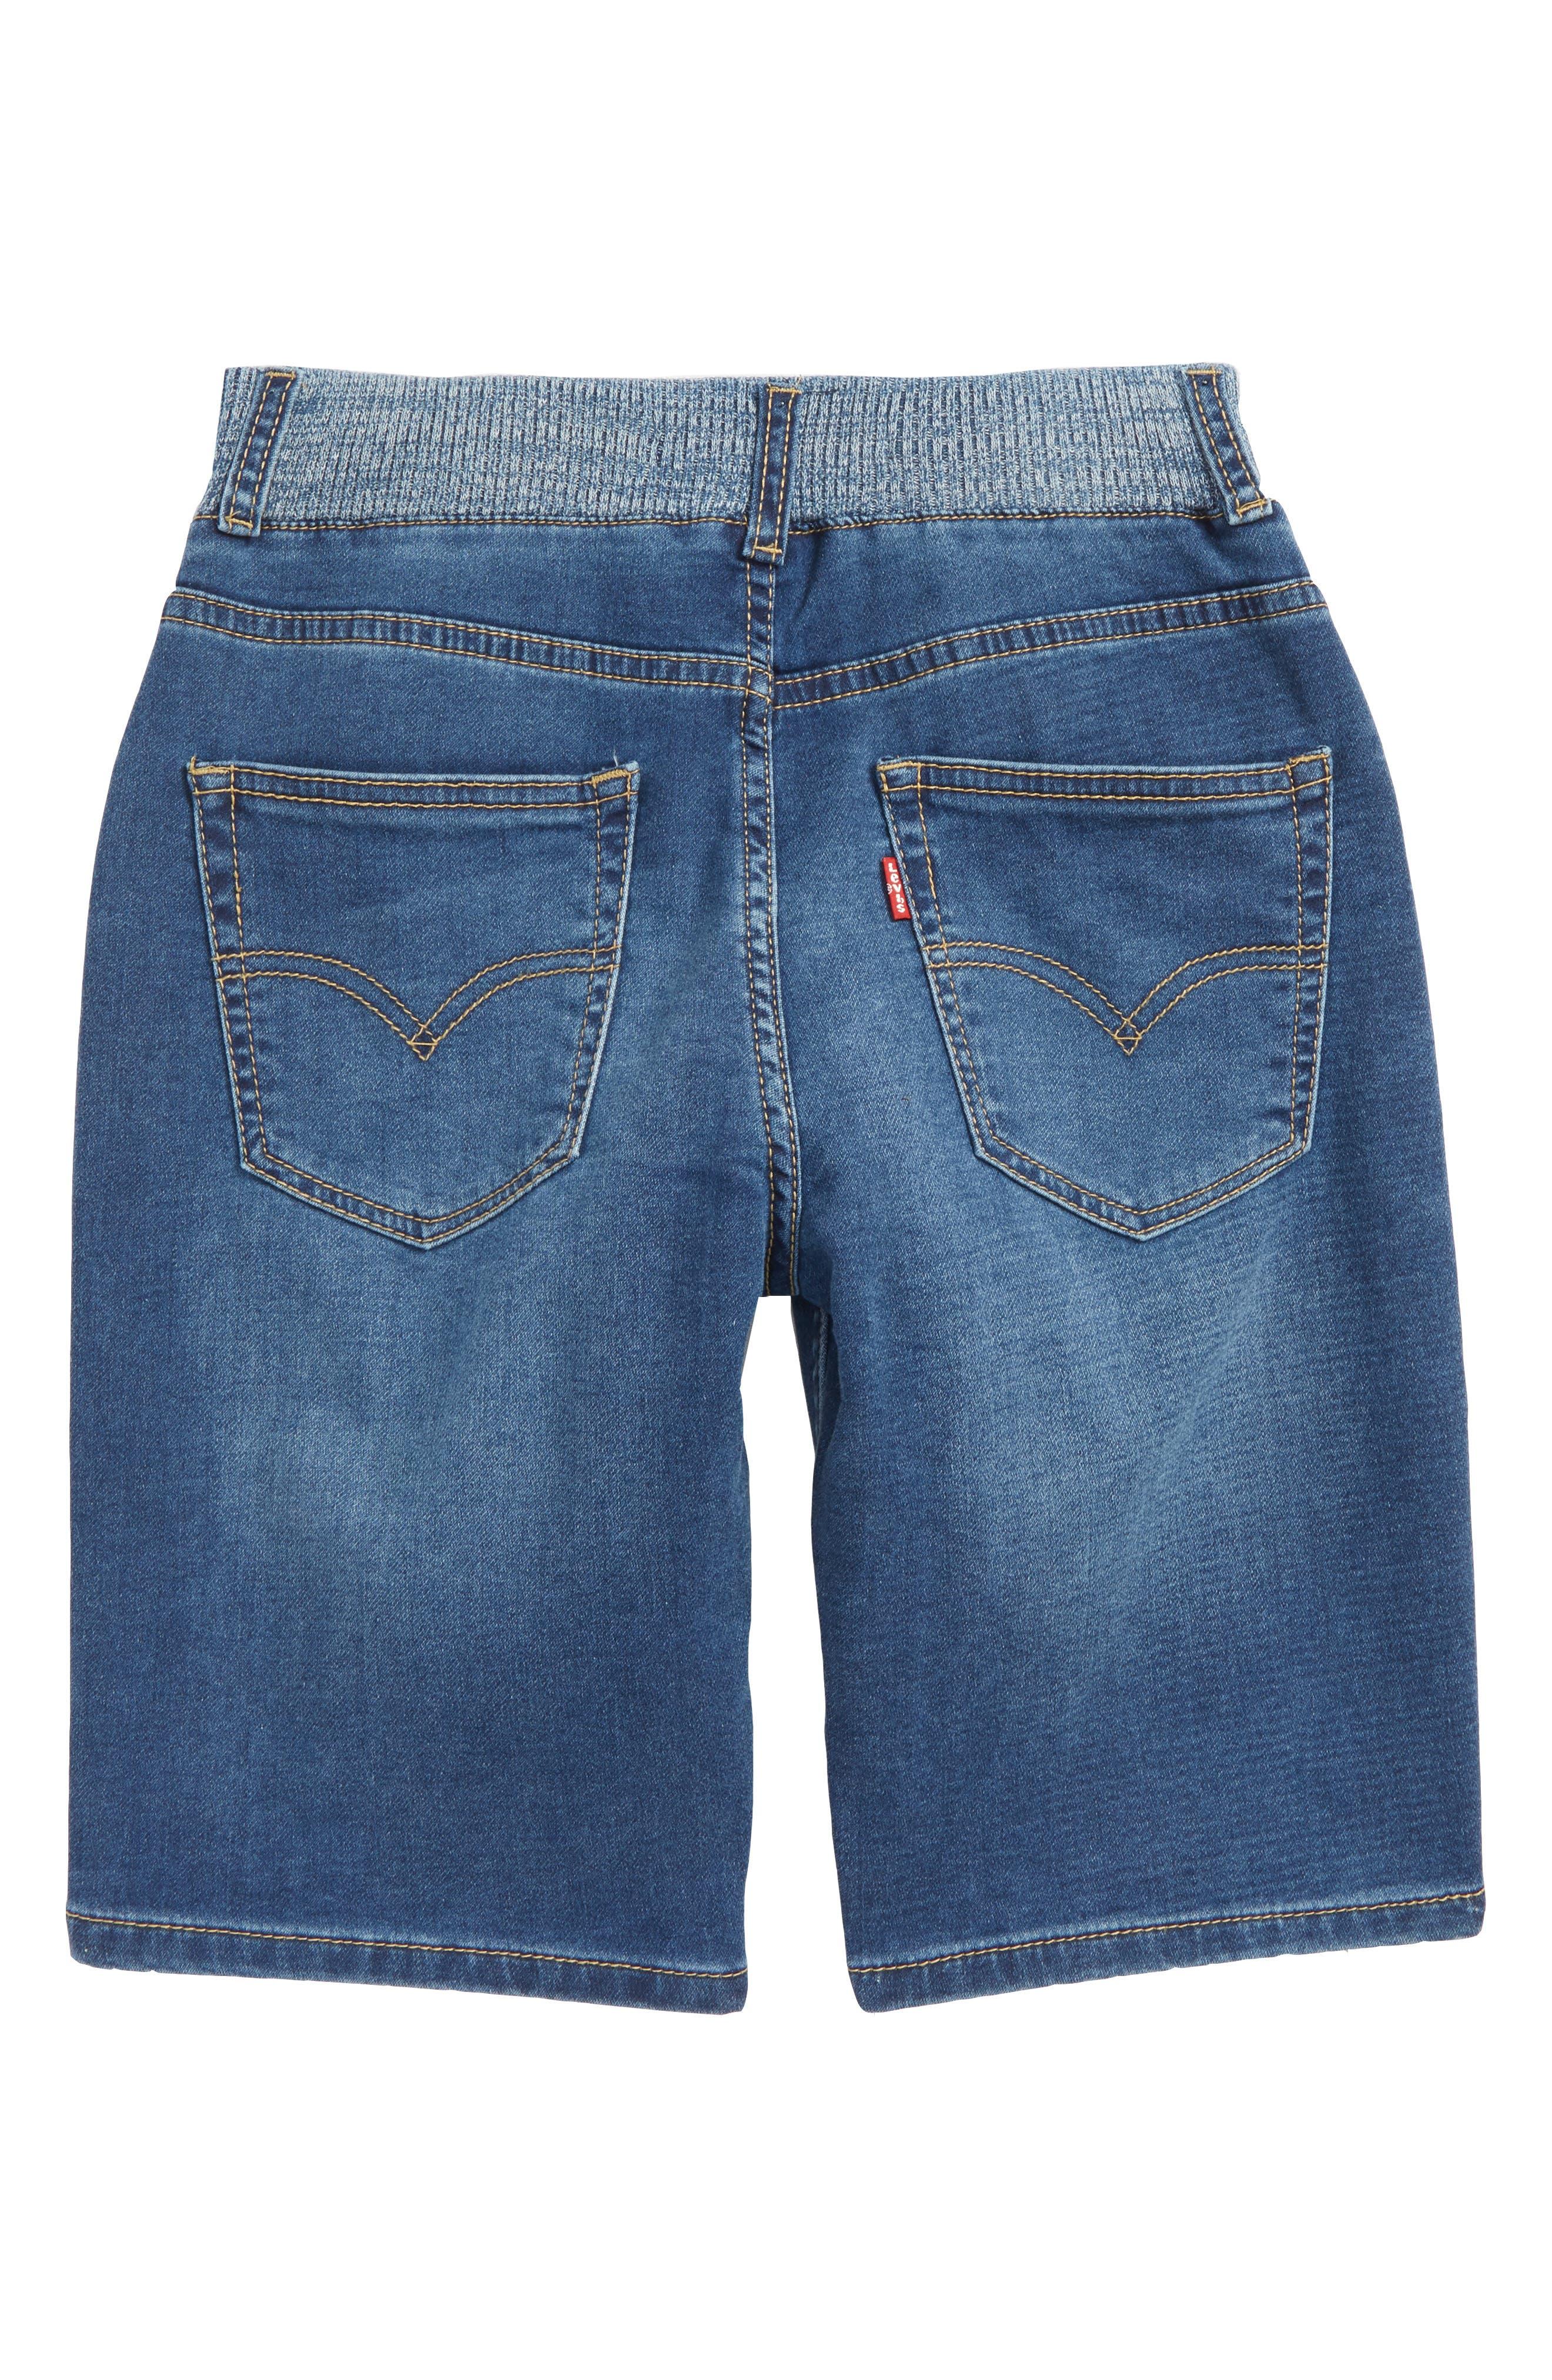 Levi's Super Chill Denim Shorts,                             Alternate thumbnail 2, color,                             Coastal Sd